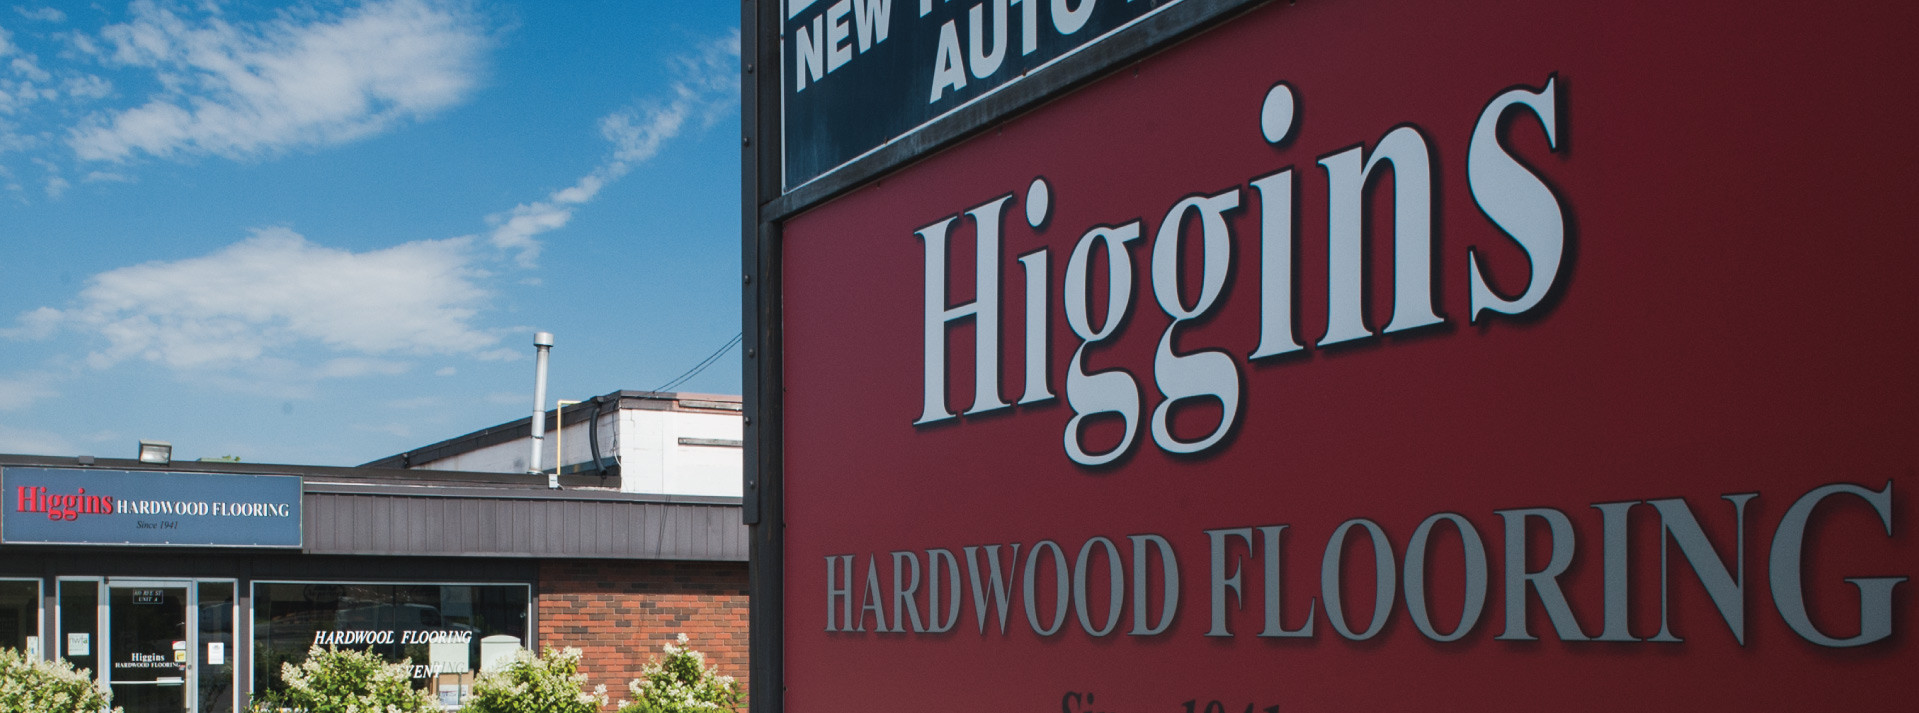 hardwood flooring deals in gta of higgins hardwood flooring in peterborough oshawa lindsay ajax inside office hours